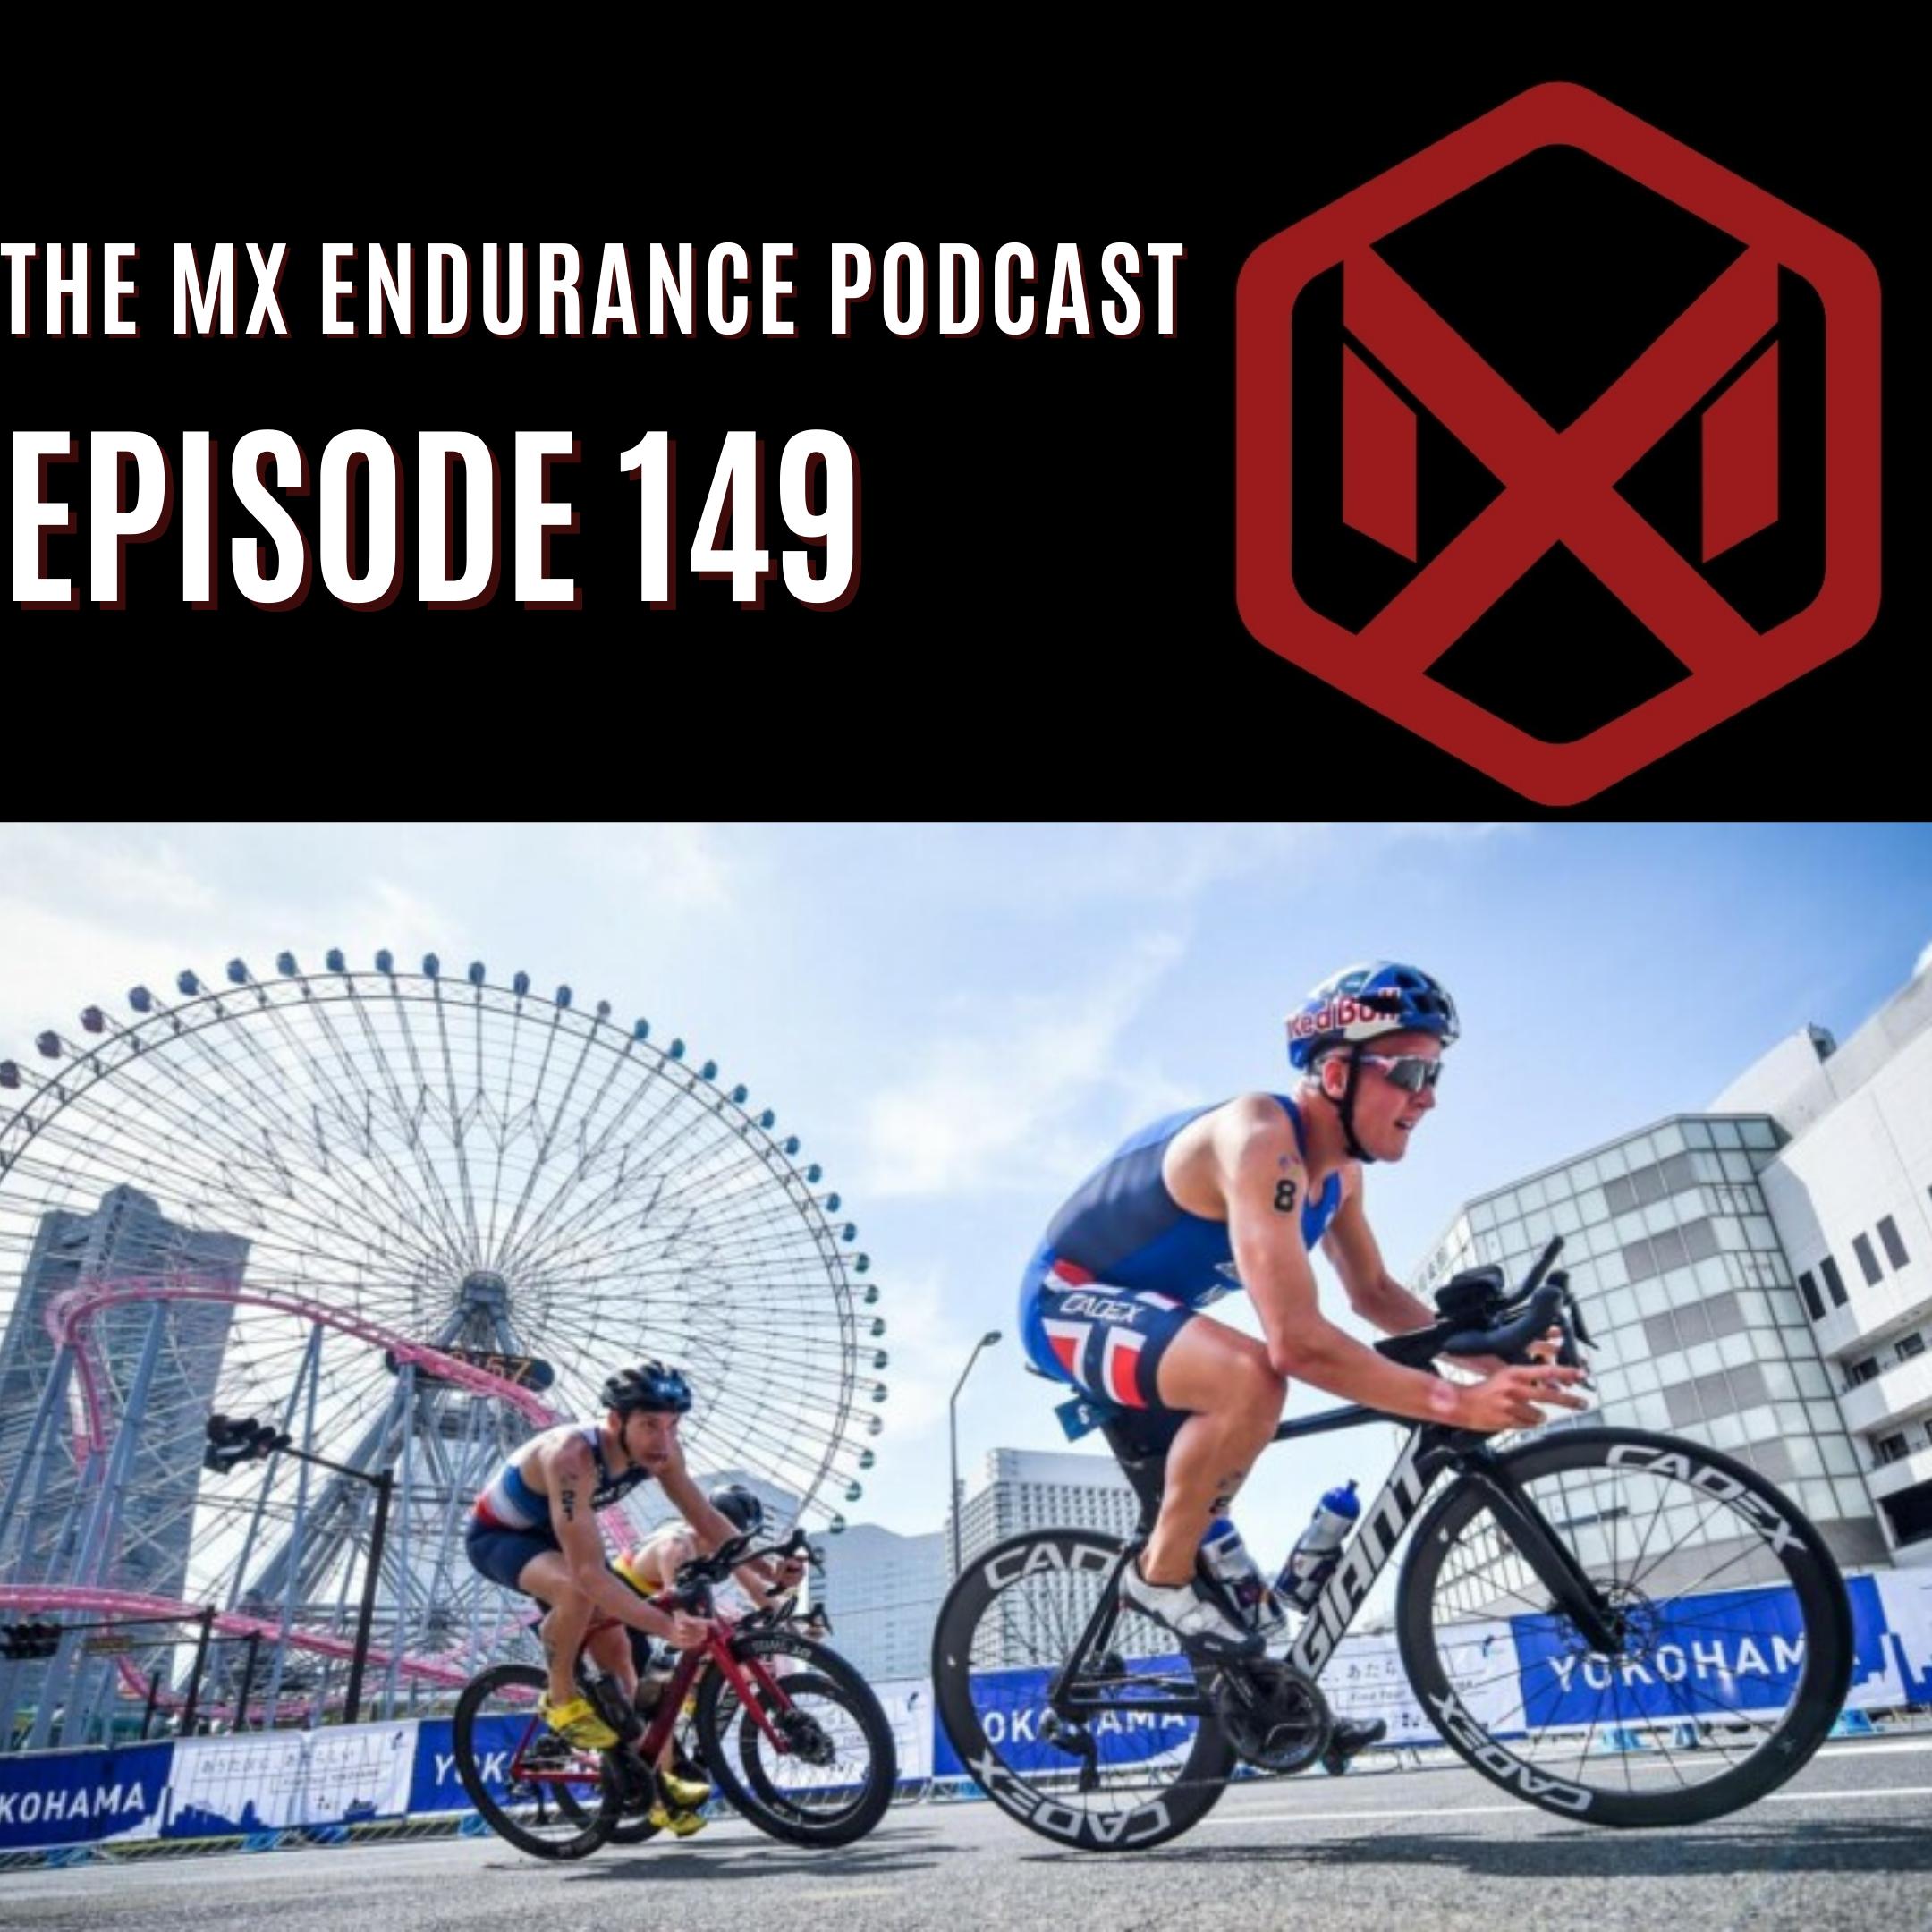 #149 - Yokohama Wrap Up with Tim Heming